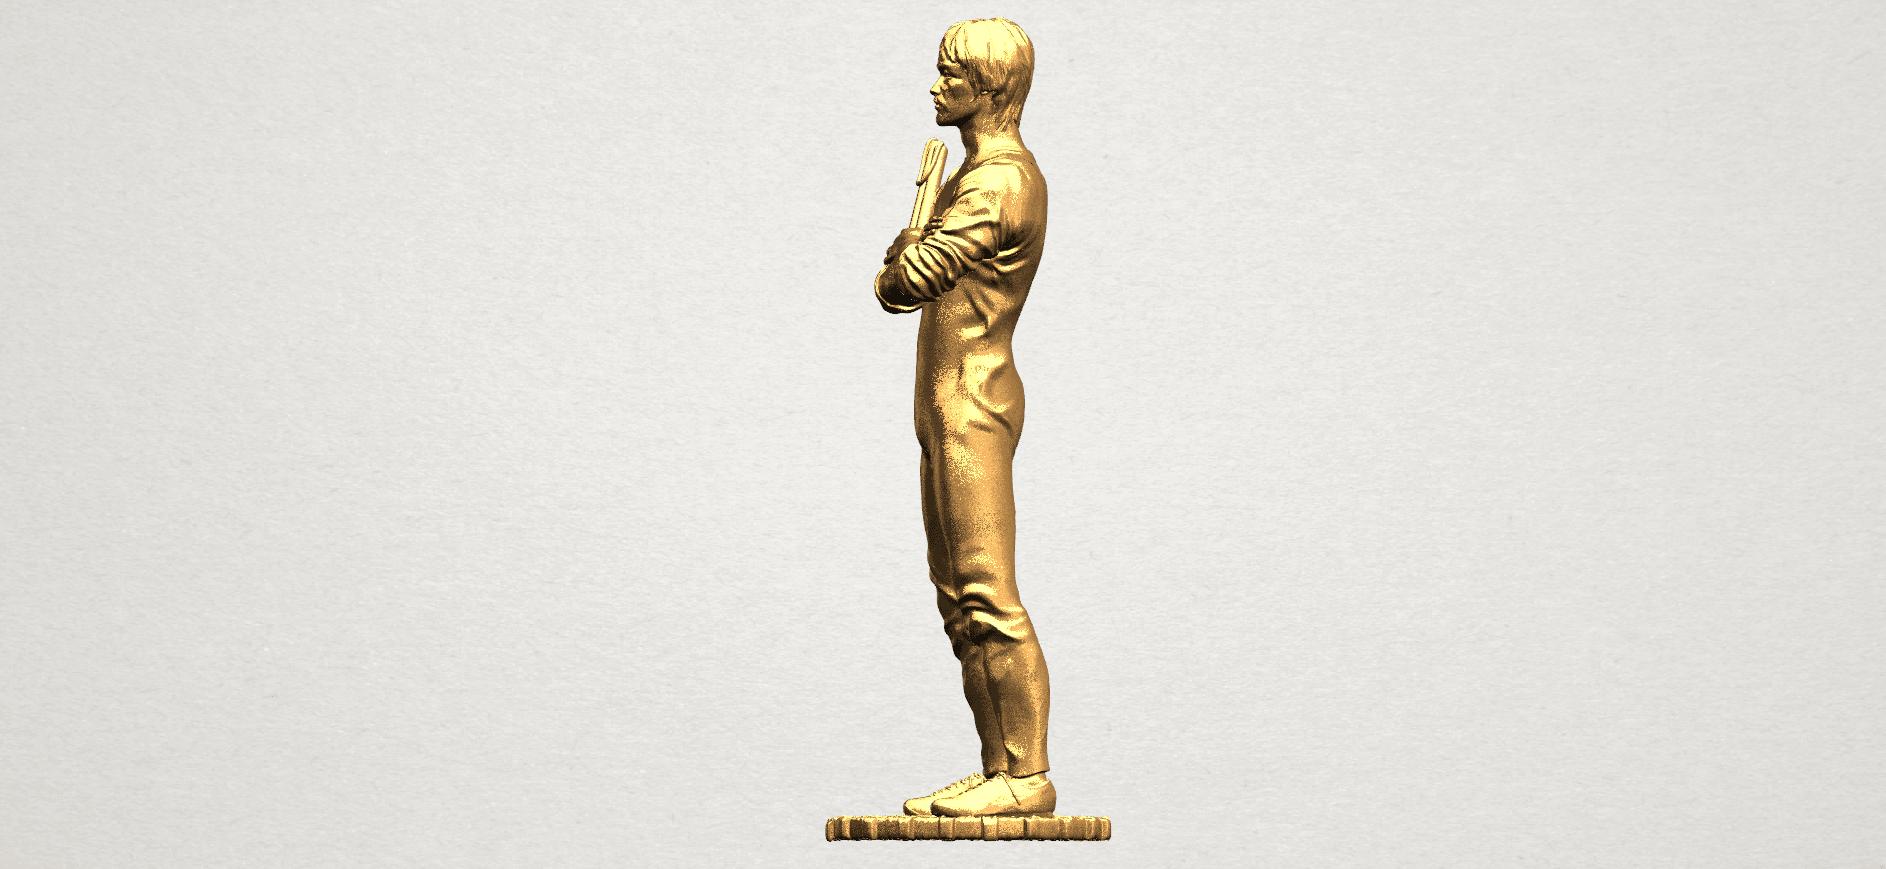 Bruce Lee A03.png Download free STL file Bruce Lee • 3D printing design, GeorgesNikkei